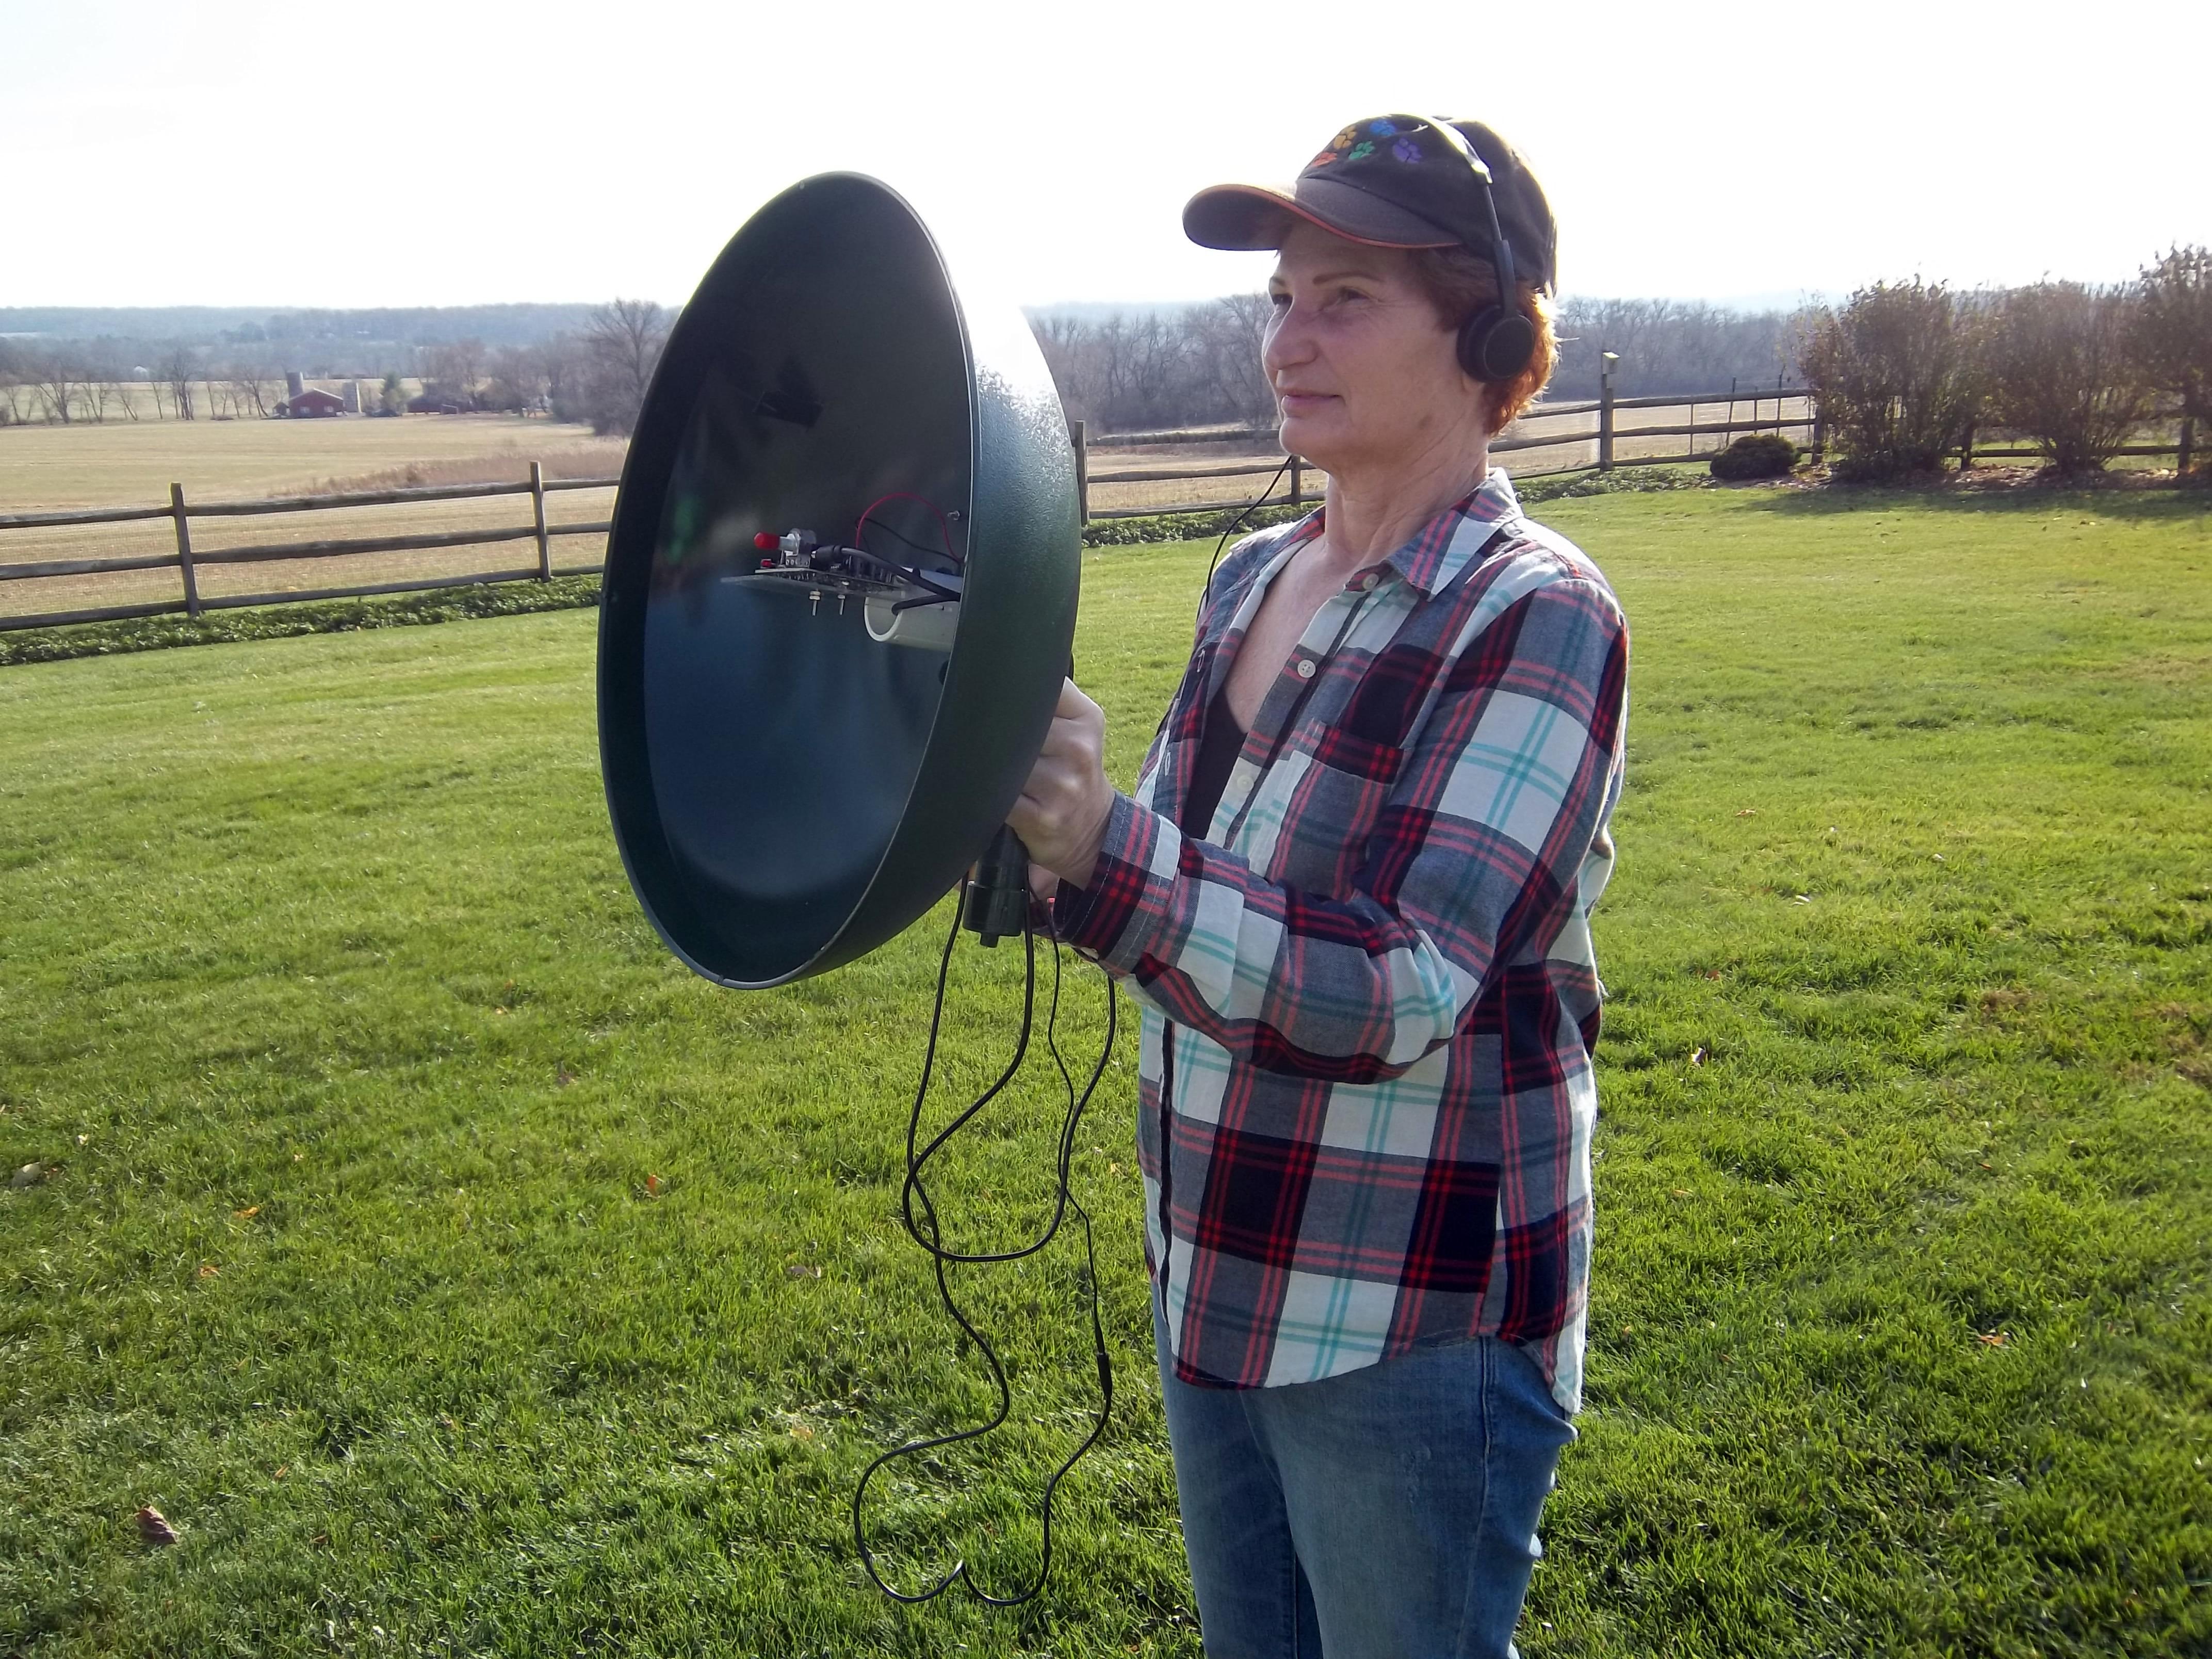 Squirrel-Baffle Spy Parabolic Microphone | Make: